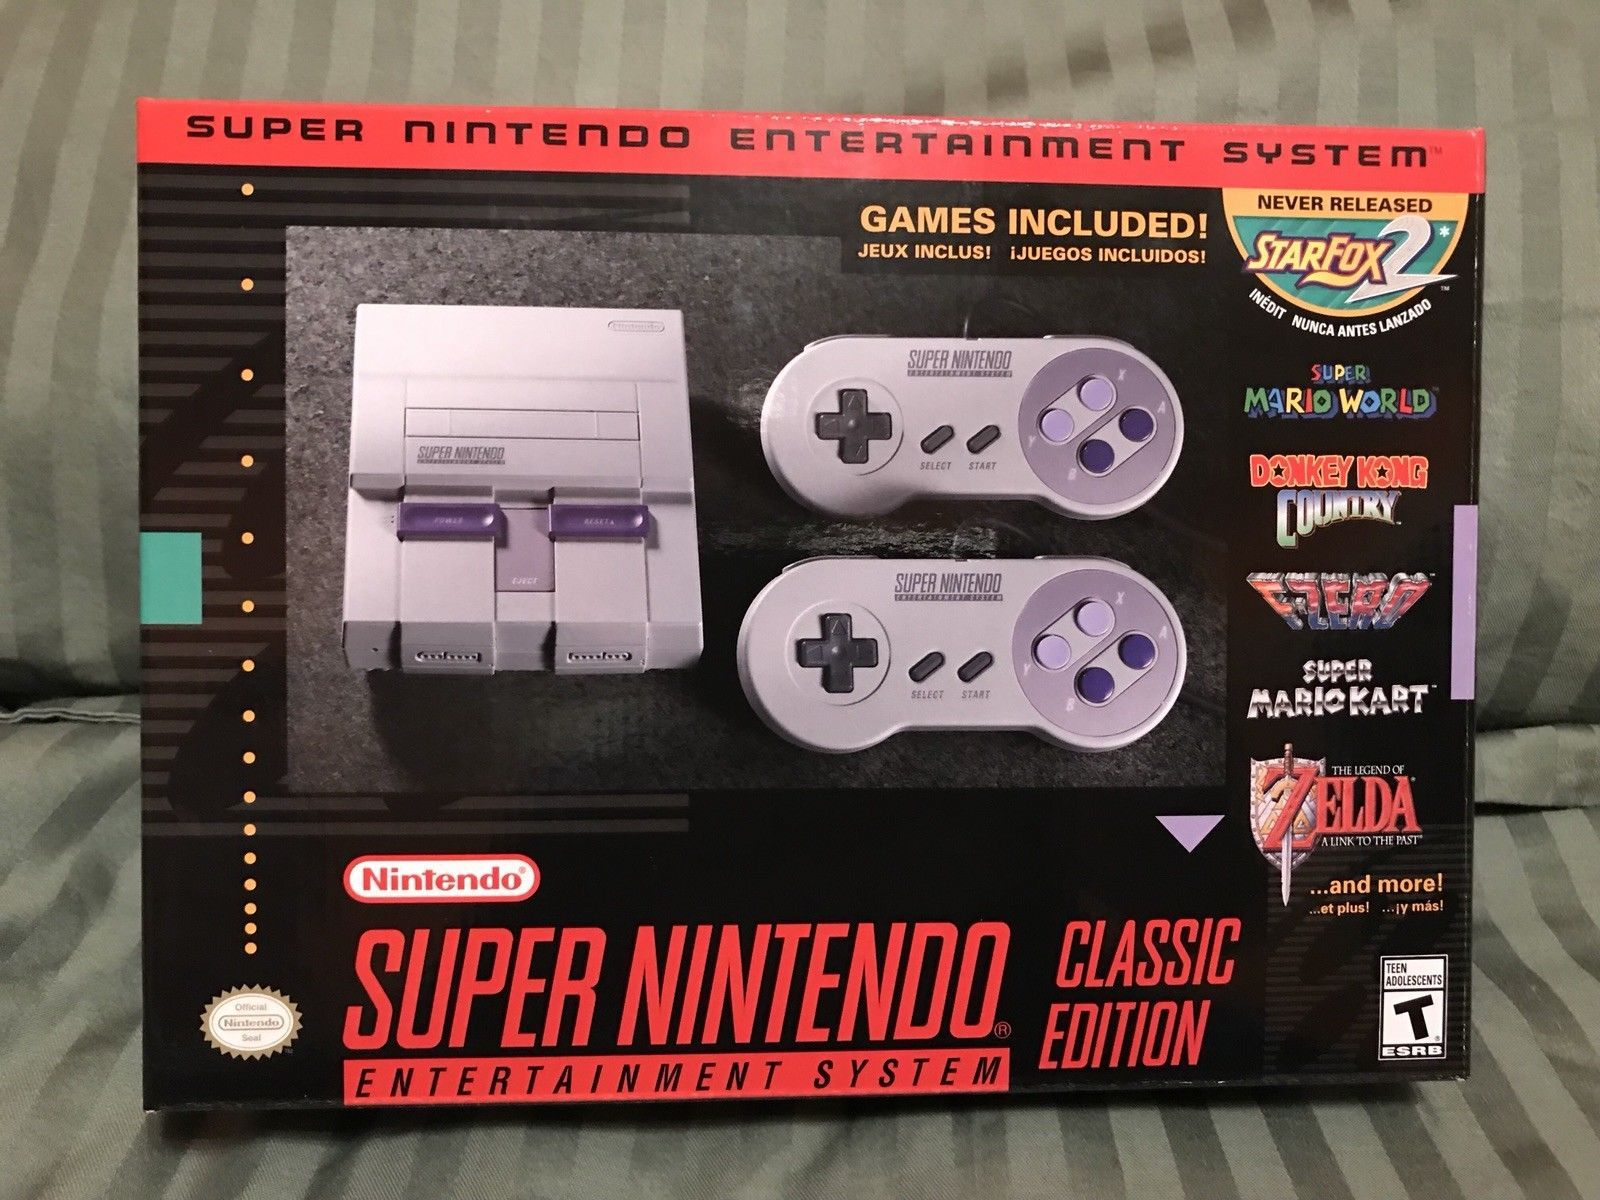 Super Nintendo Entertainment System Super Nes Classic Edition